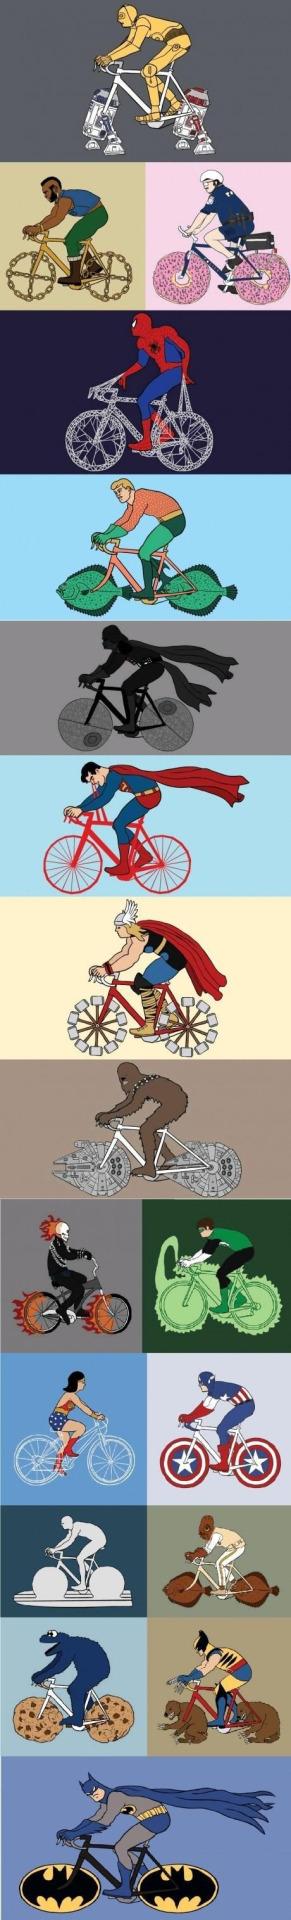 BIKE THEMED IMAGES    super bikes